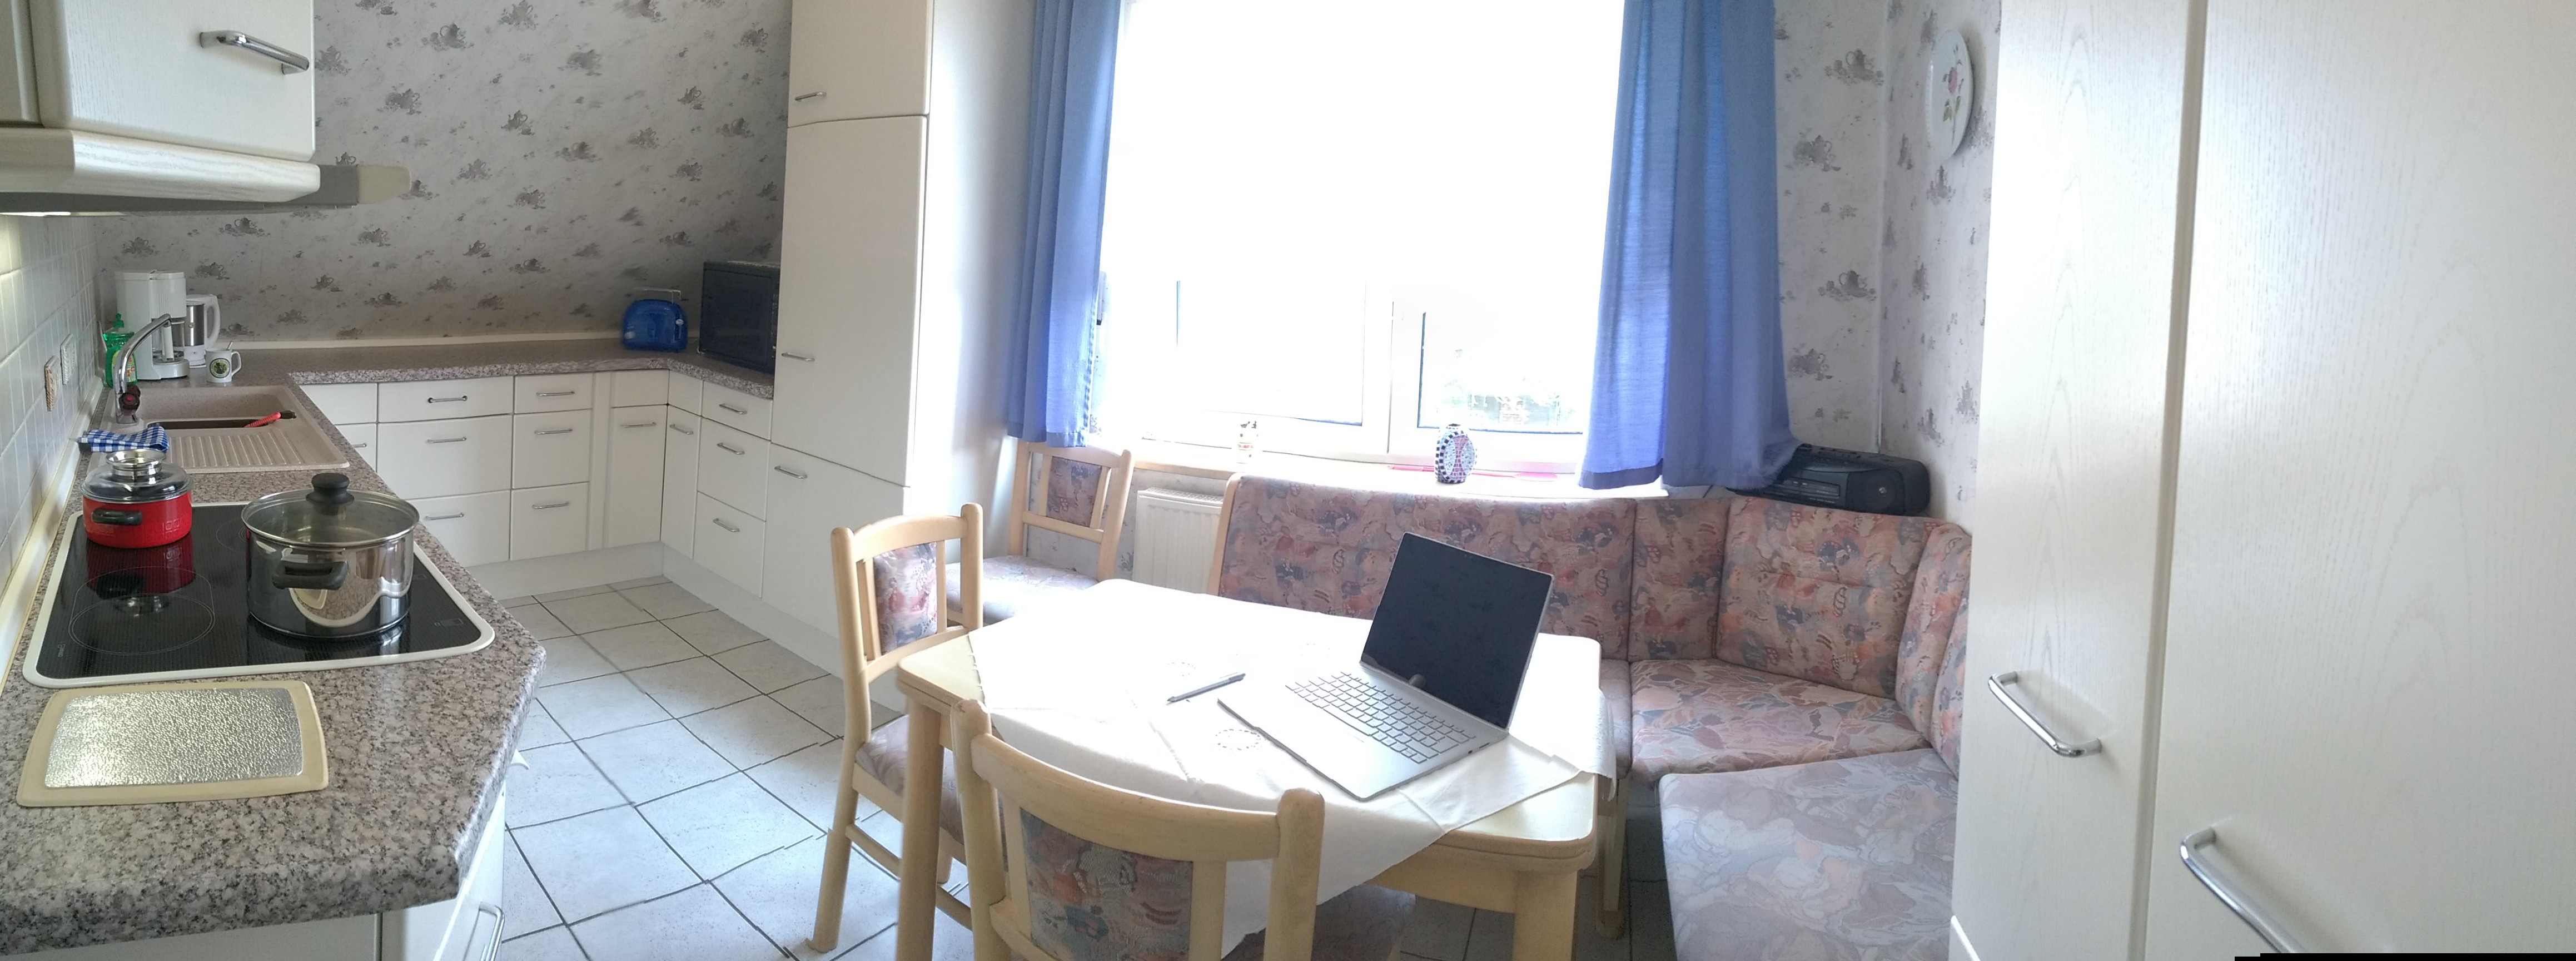 Küche (Panorama-Aufnahme)